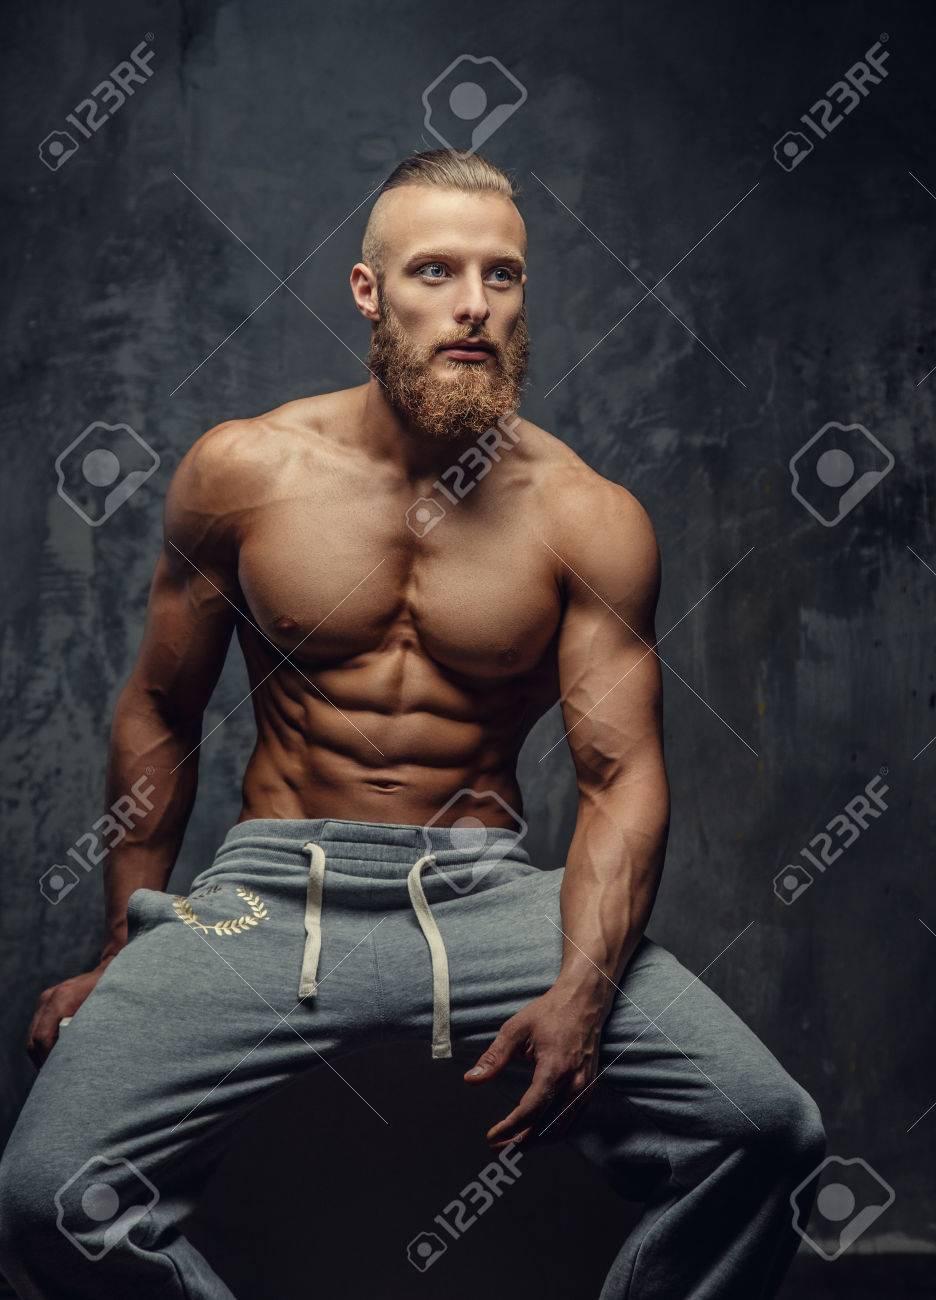 Shirtless Muscular Bodybuilder With Beard Stock Photo 81643250